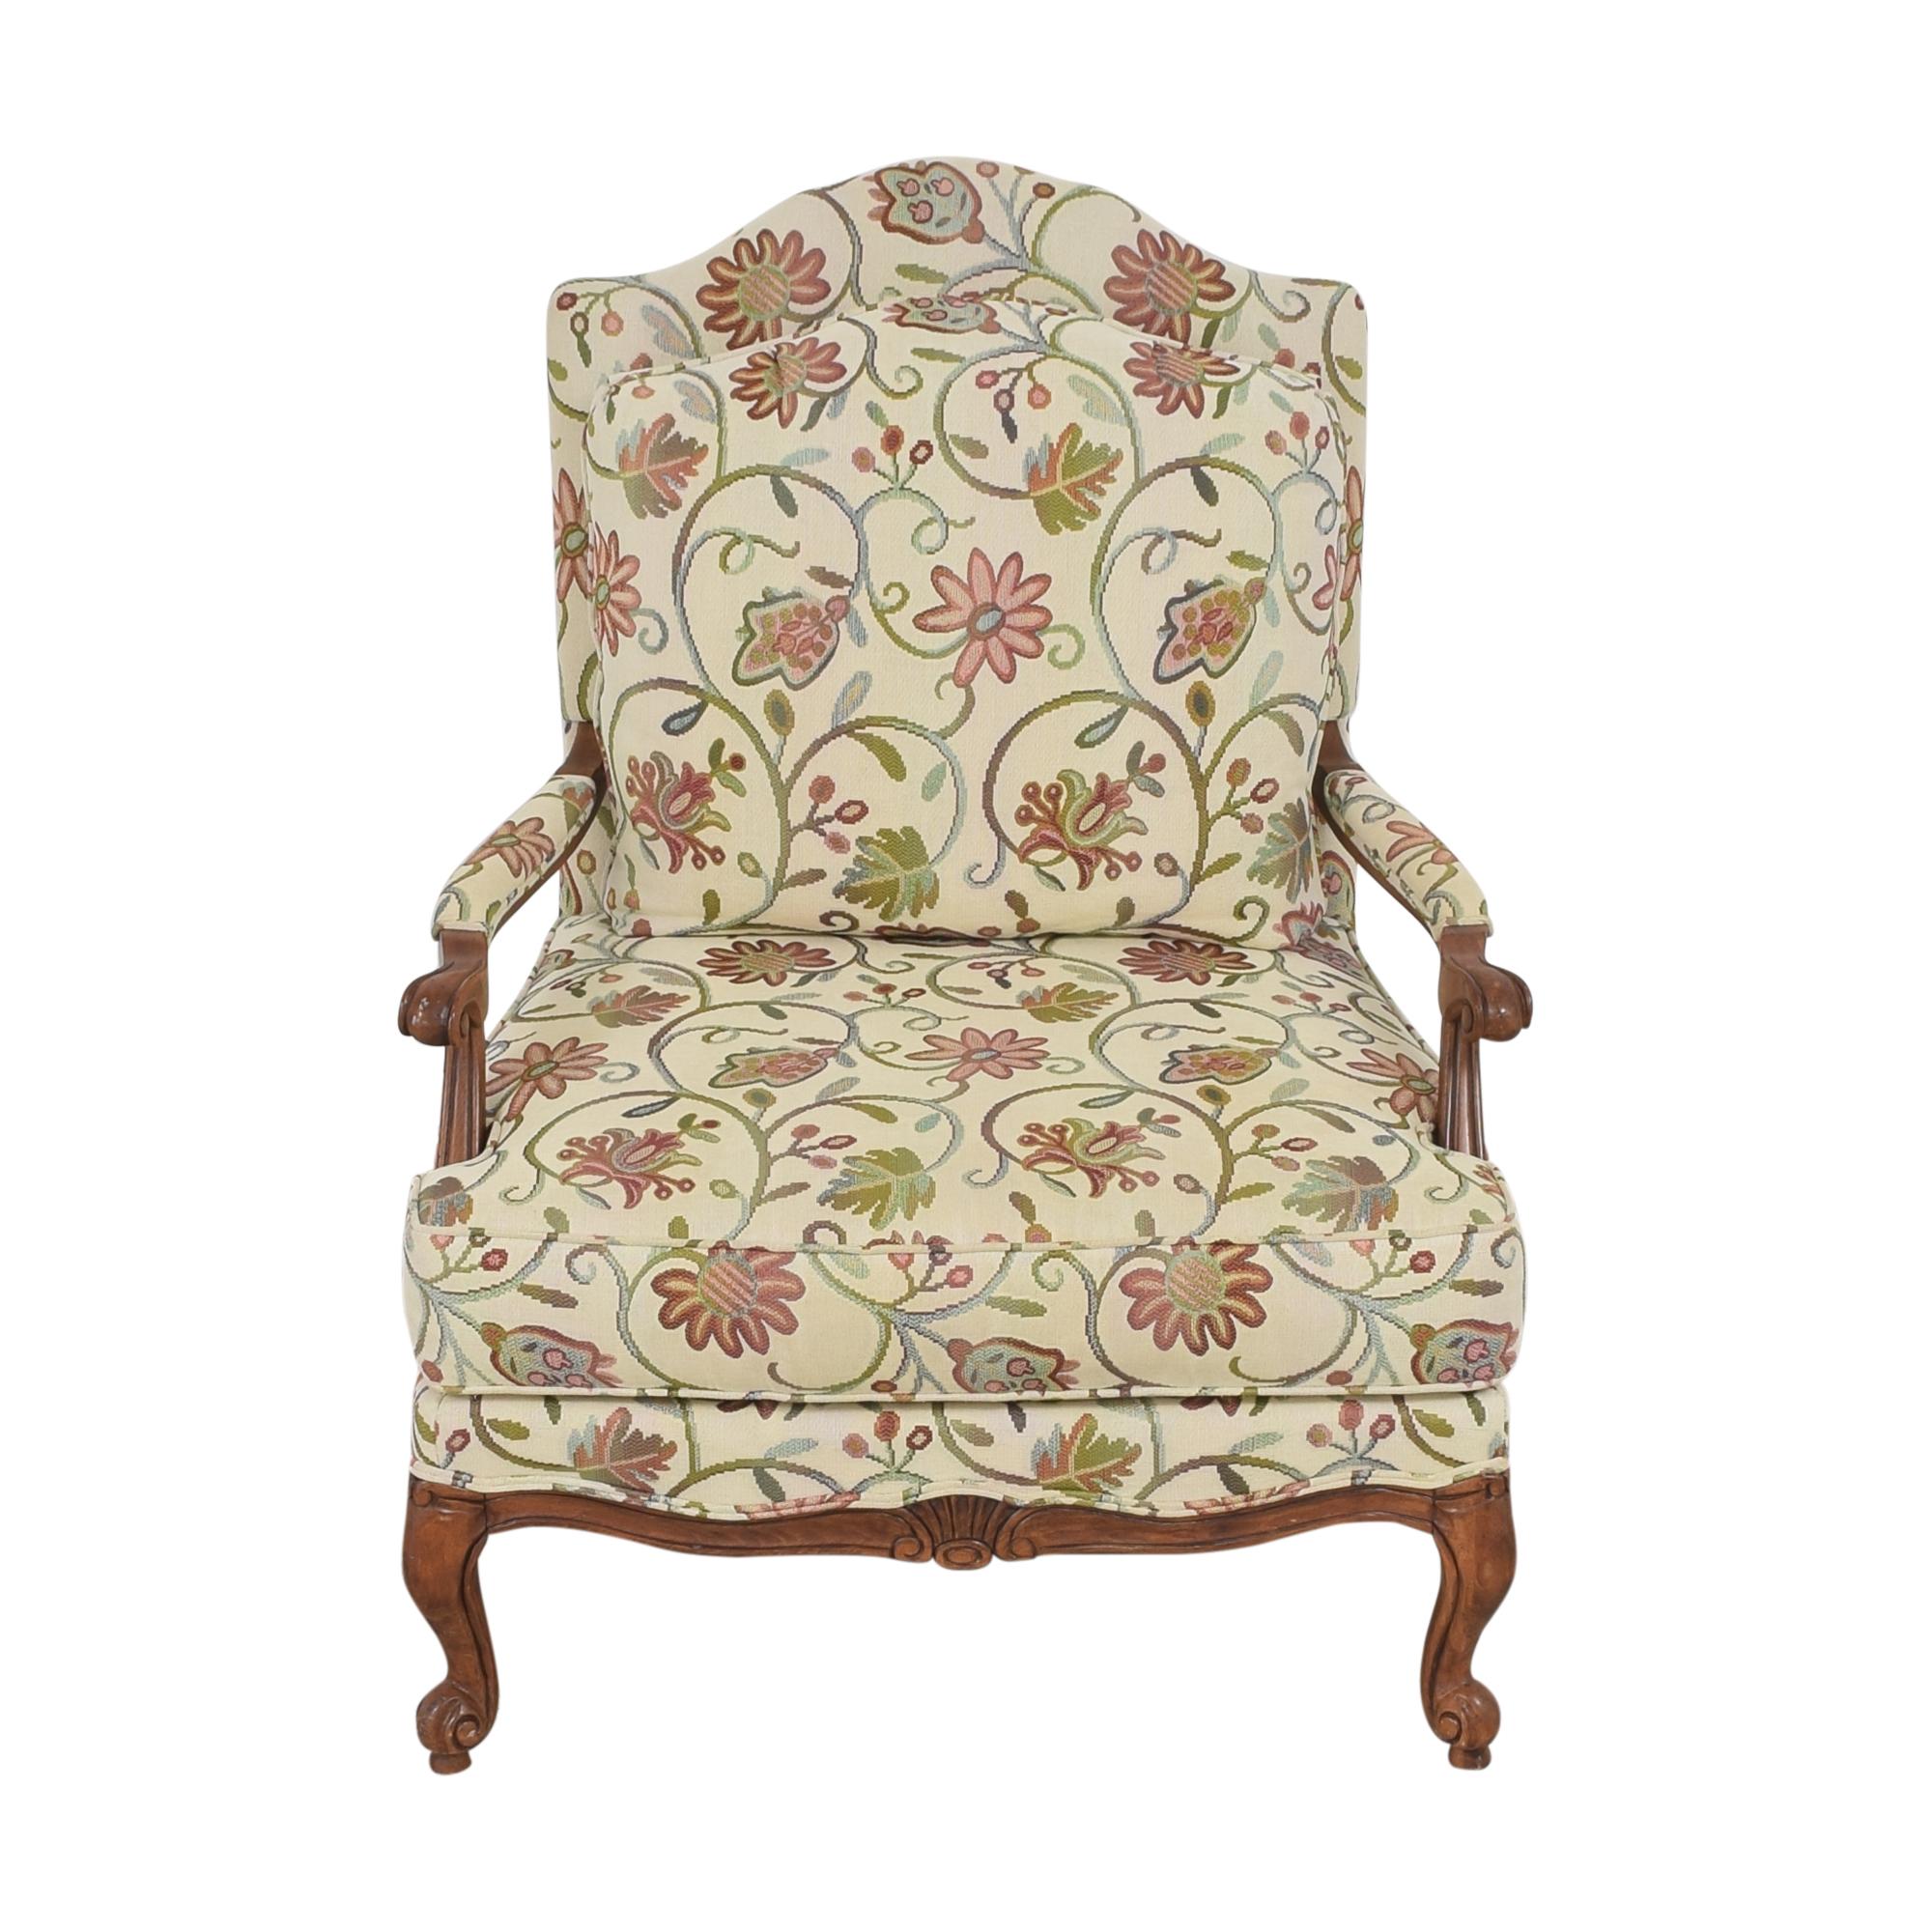 buy Ethan Allen Ethan Allen Harris Floral Chair online